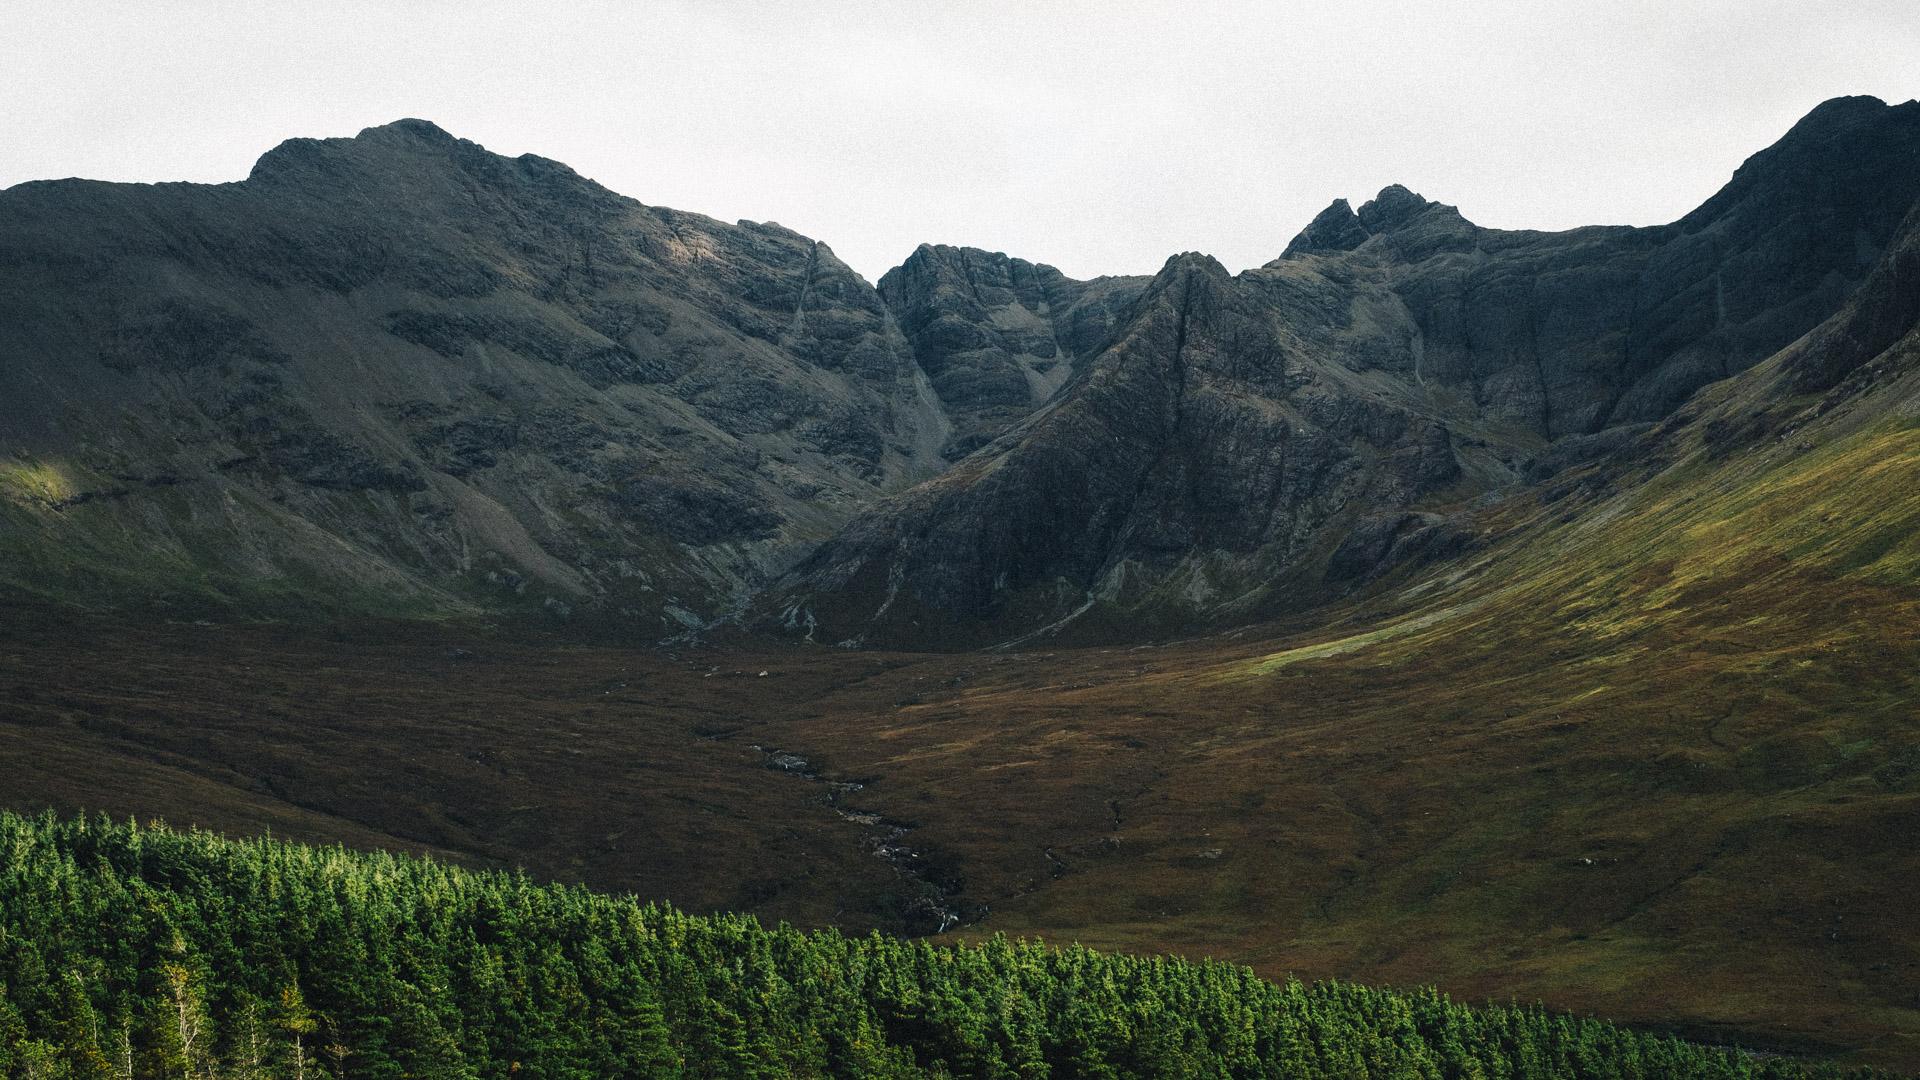 Black Cuillin Mountains, Isle of Skye, Scotland